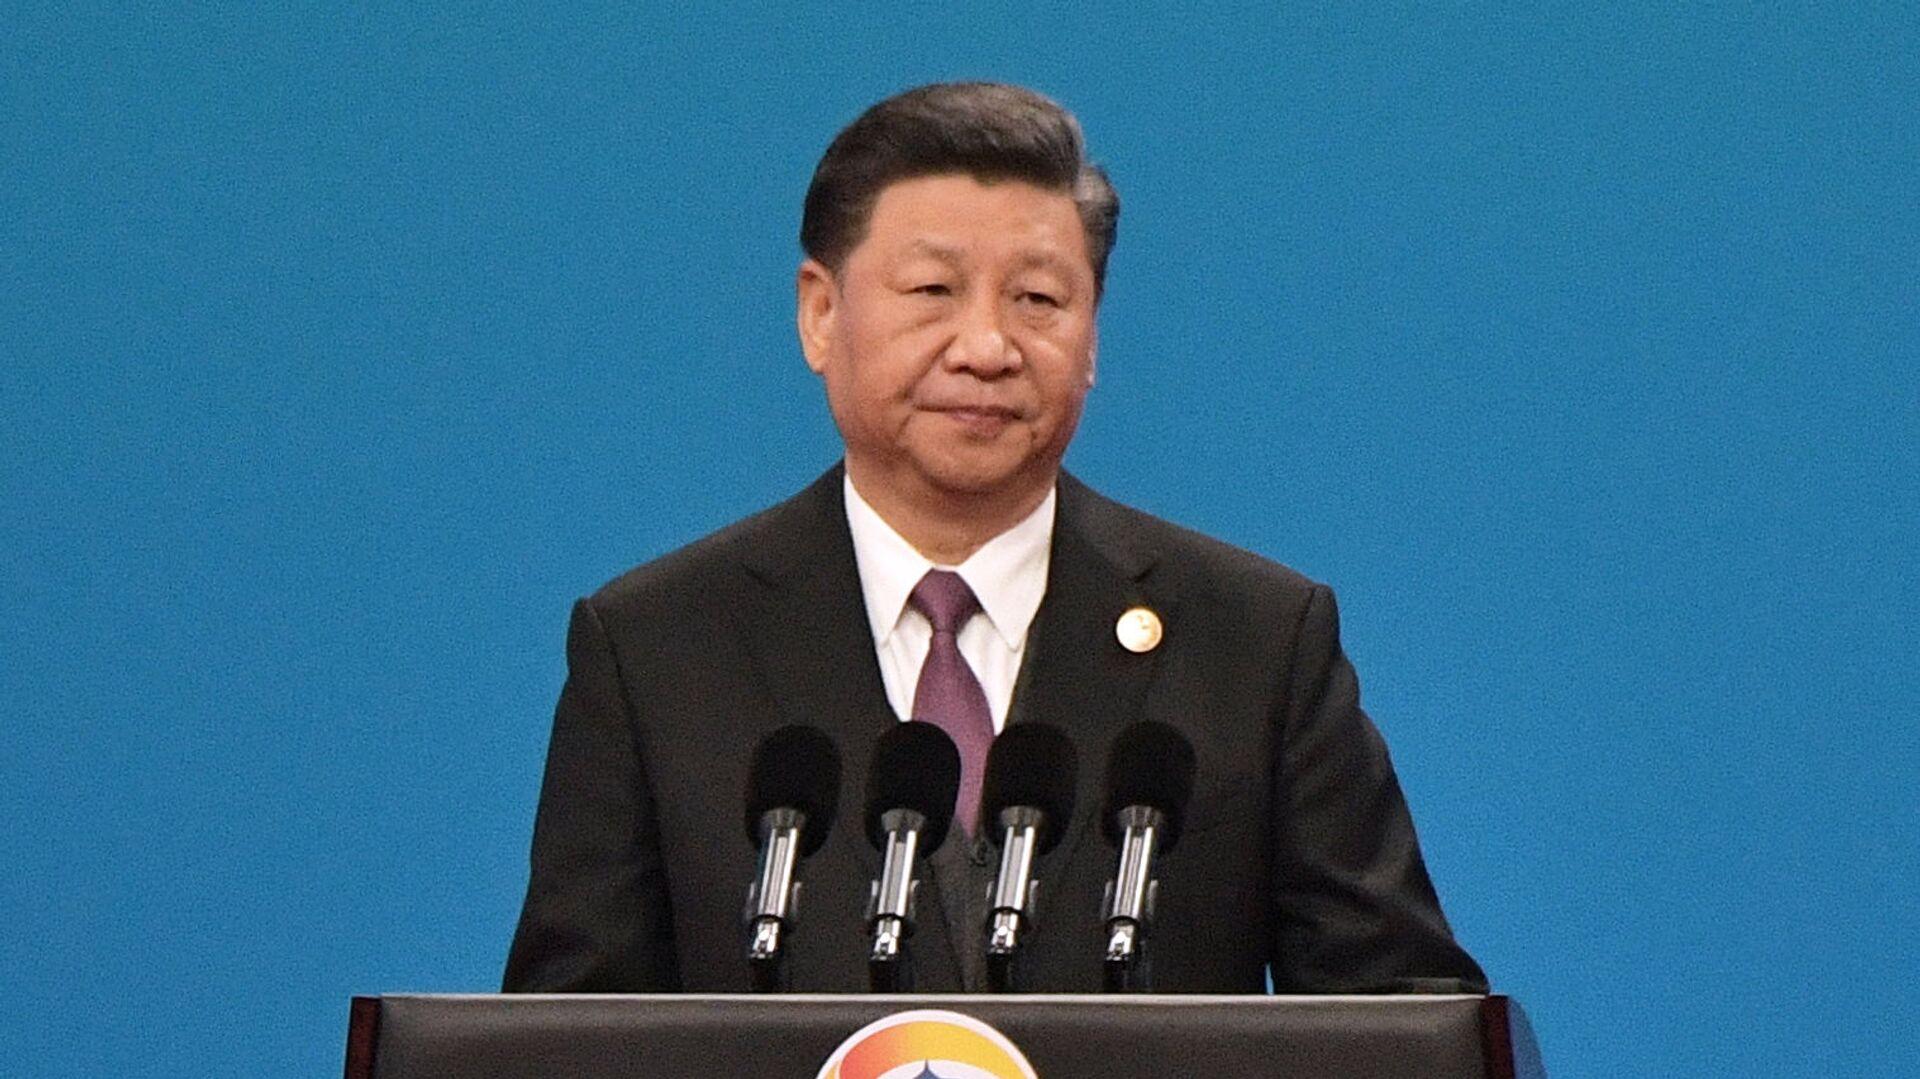 Xi Jinping en un foro sobre la Iniciativa de la Franja y la Ruta de la Seda - Sputnik Mundo, 1920, 02.09.2021